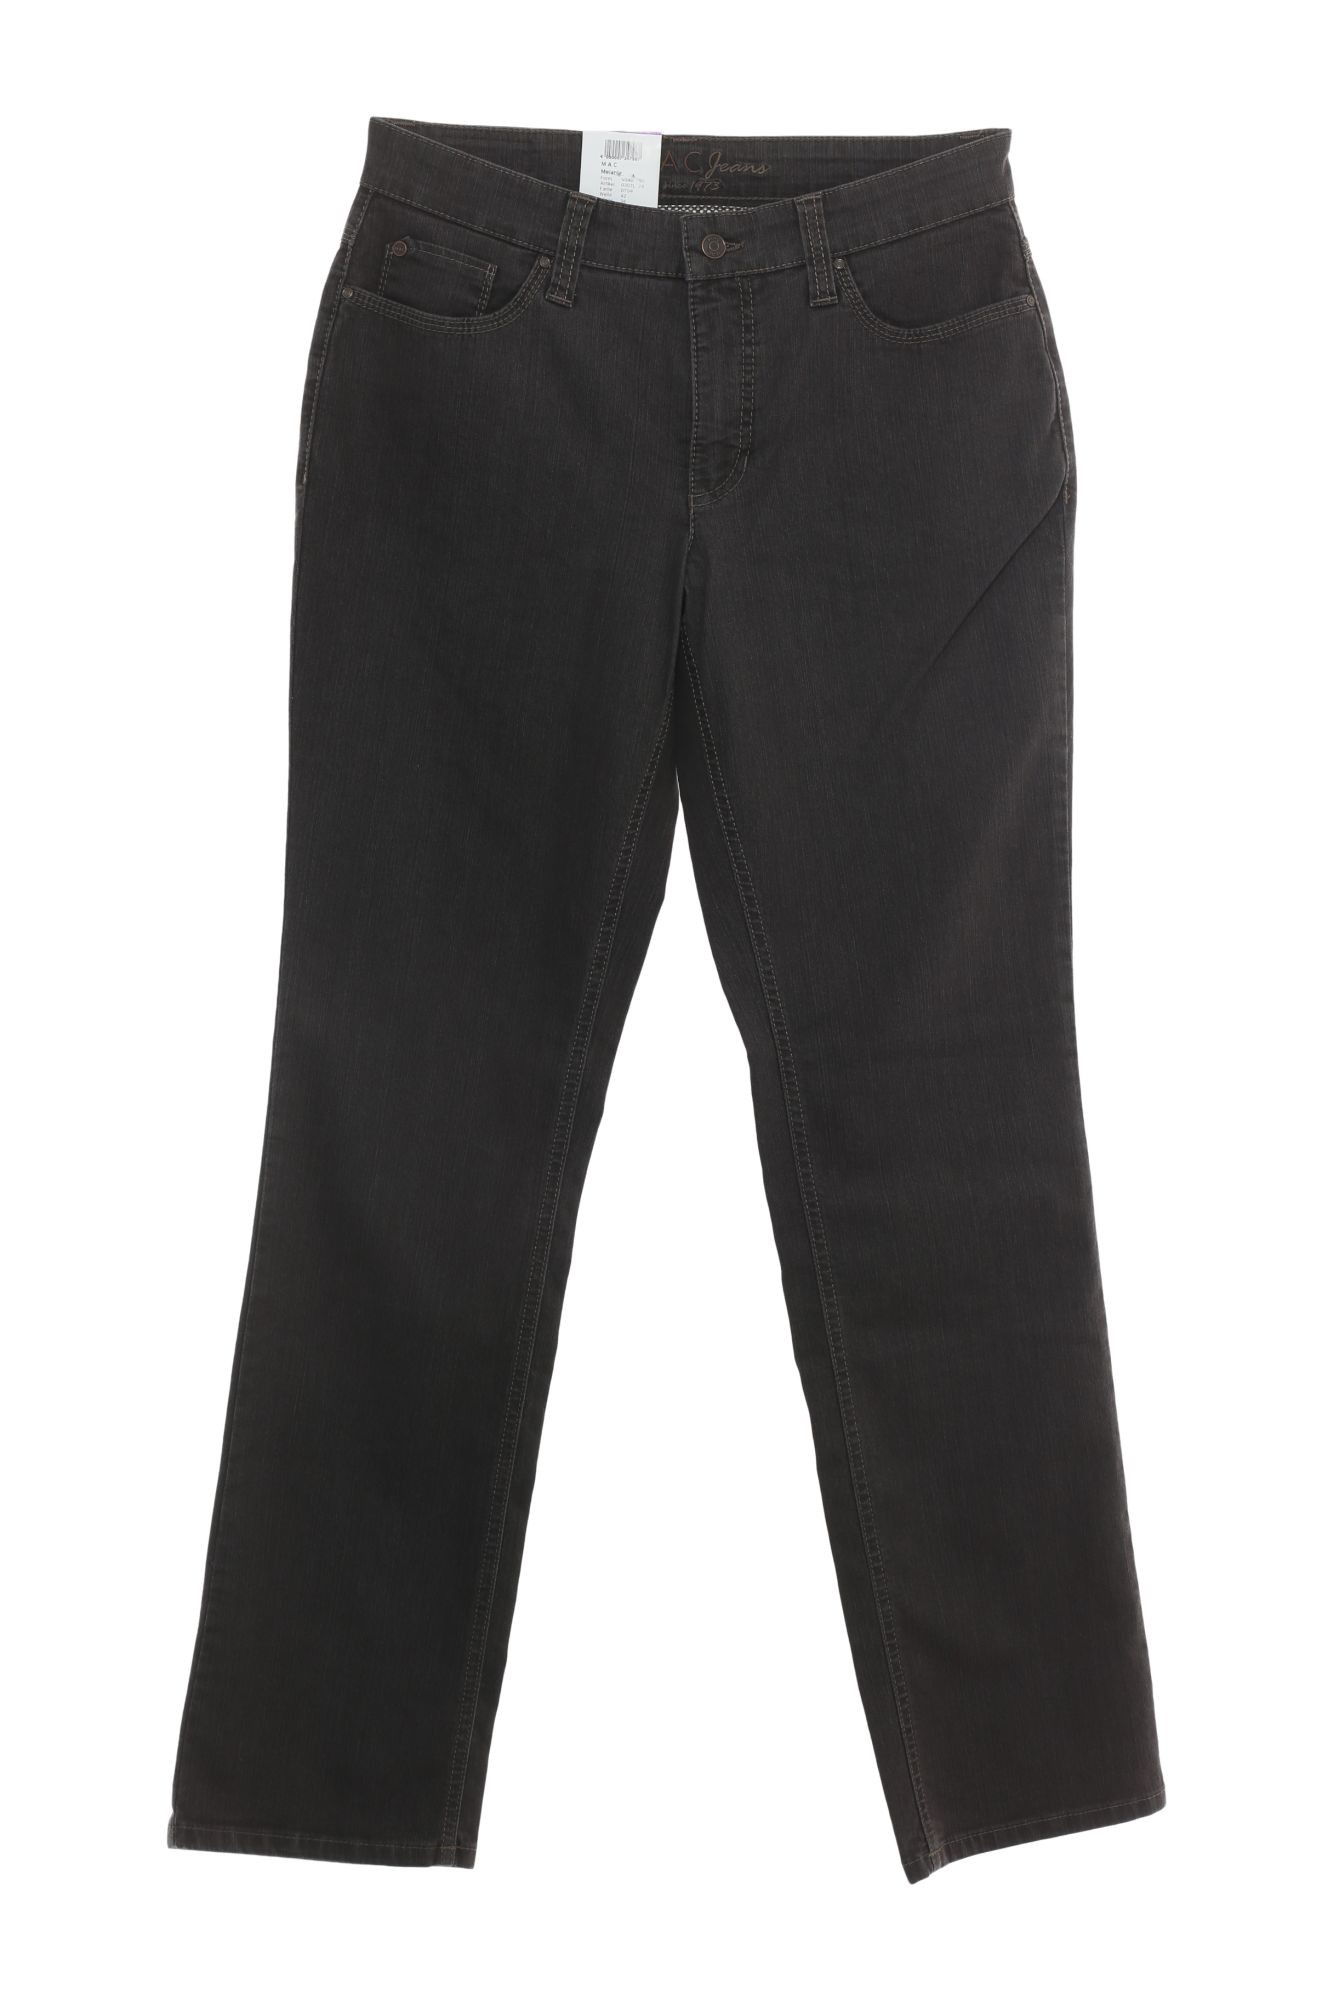 mac jeans melanie damen stretch feminine fit ebay. Black Bedroom Furniture Sets. Home Design Ideas